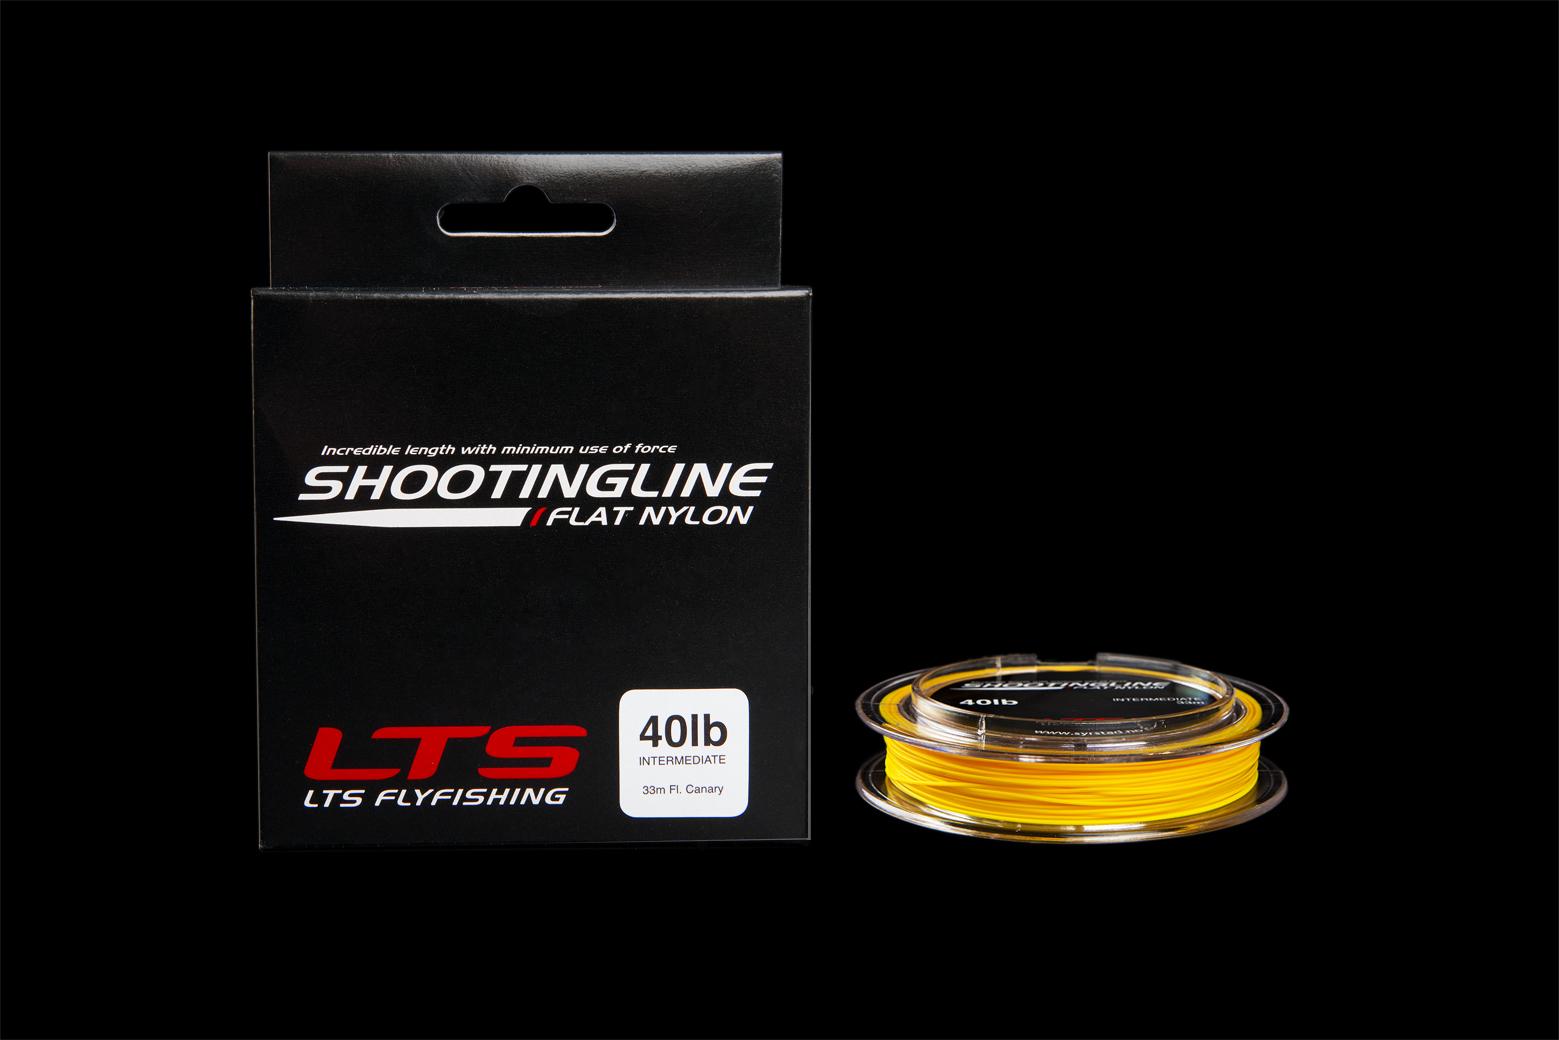 LTS Shooting Line 40lb